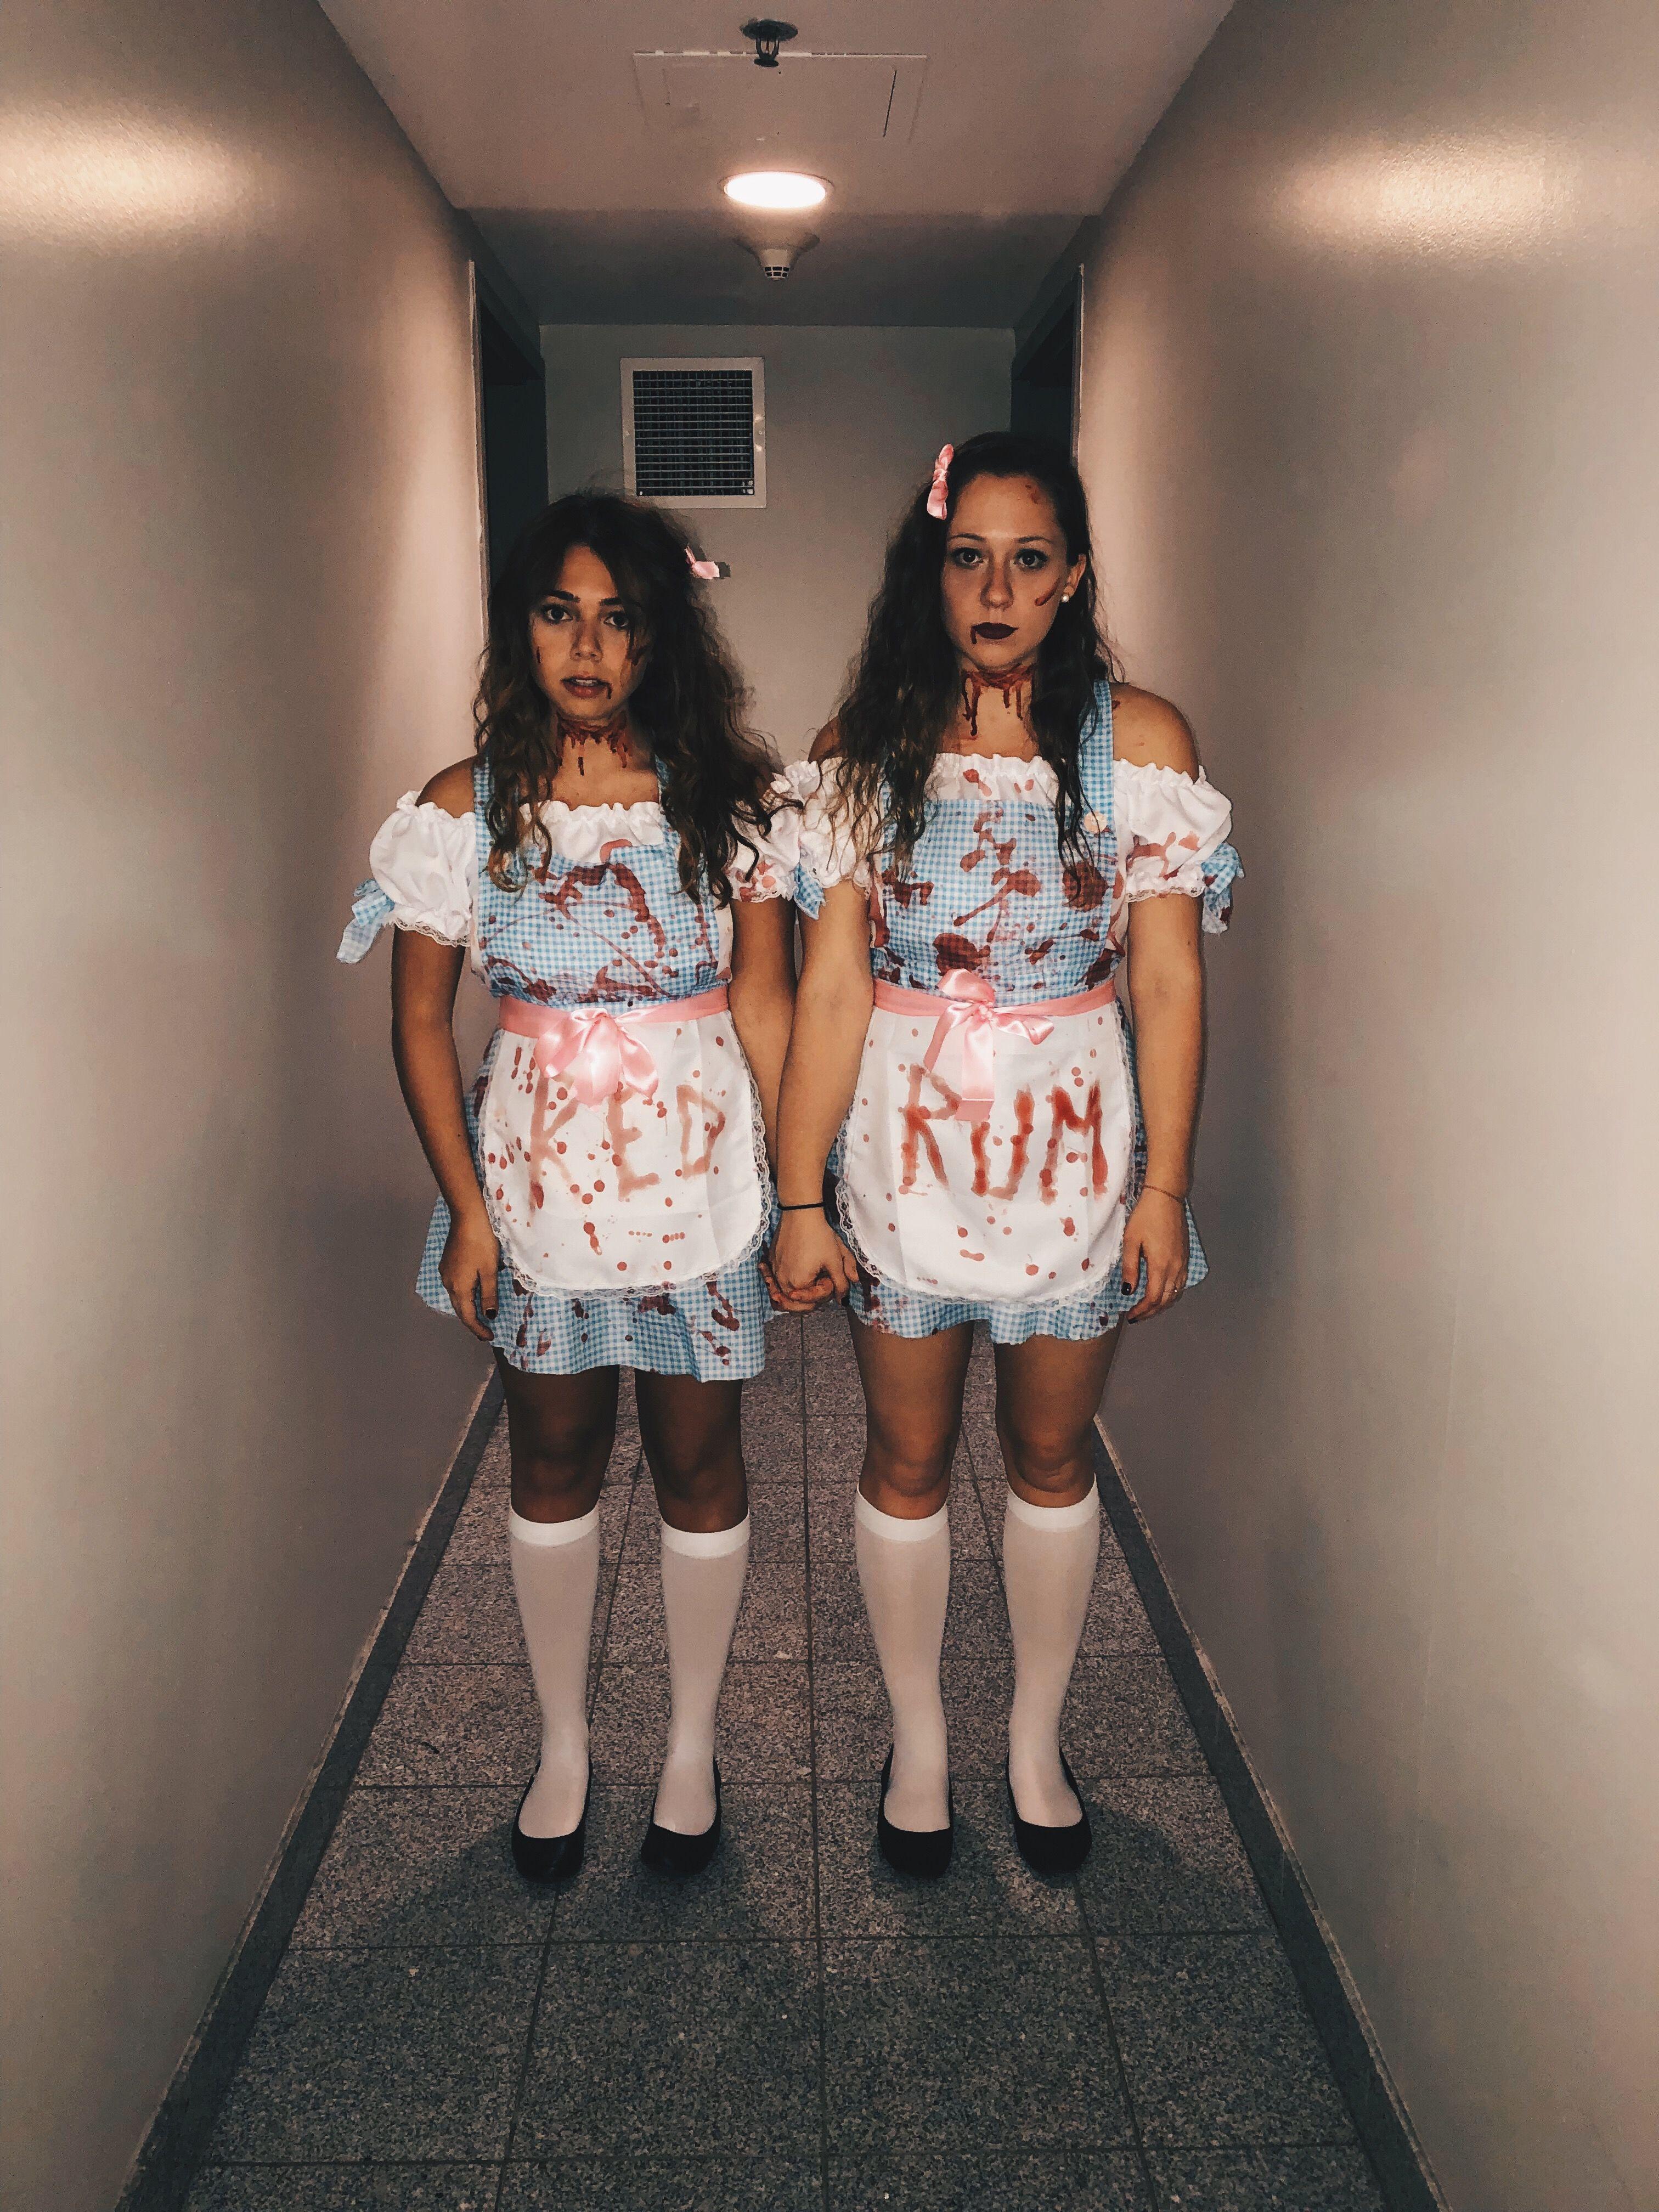 The Shining twins Halloween costume t i p s Pinterest